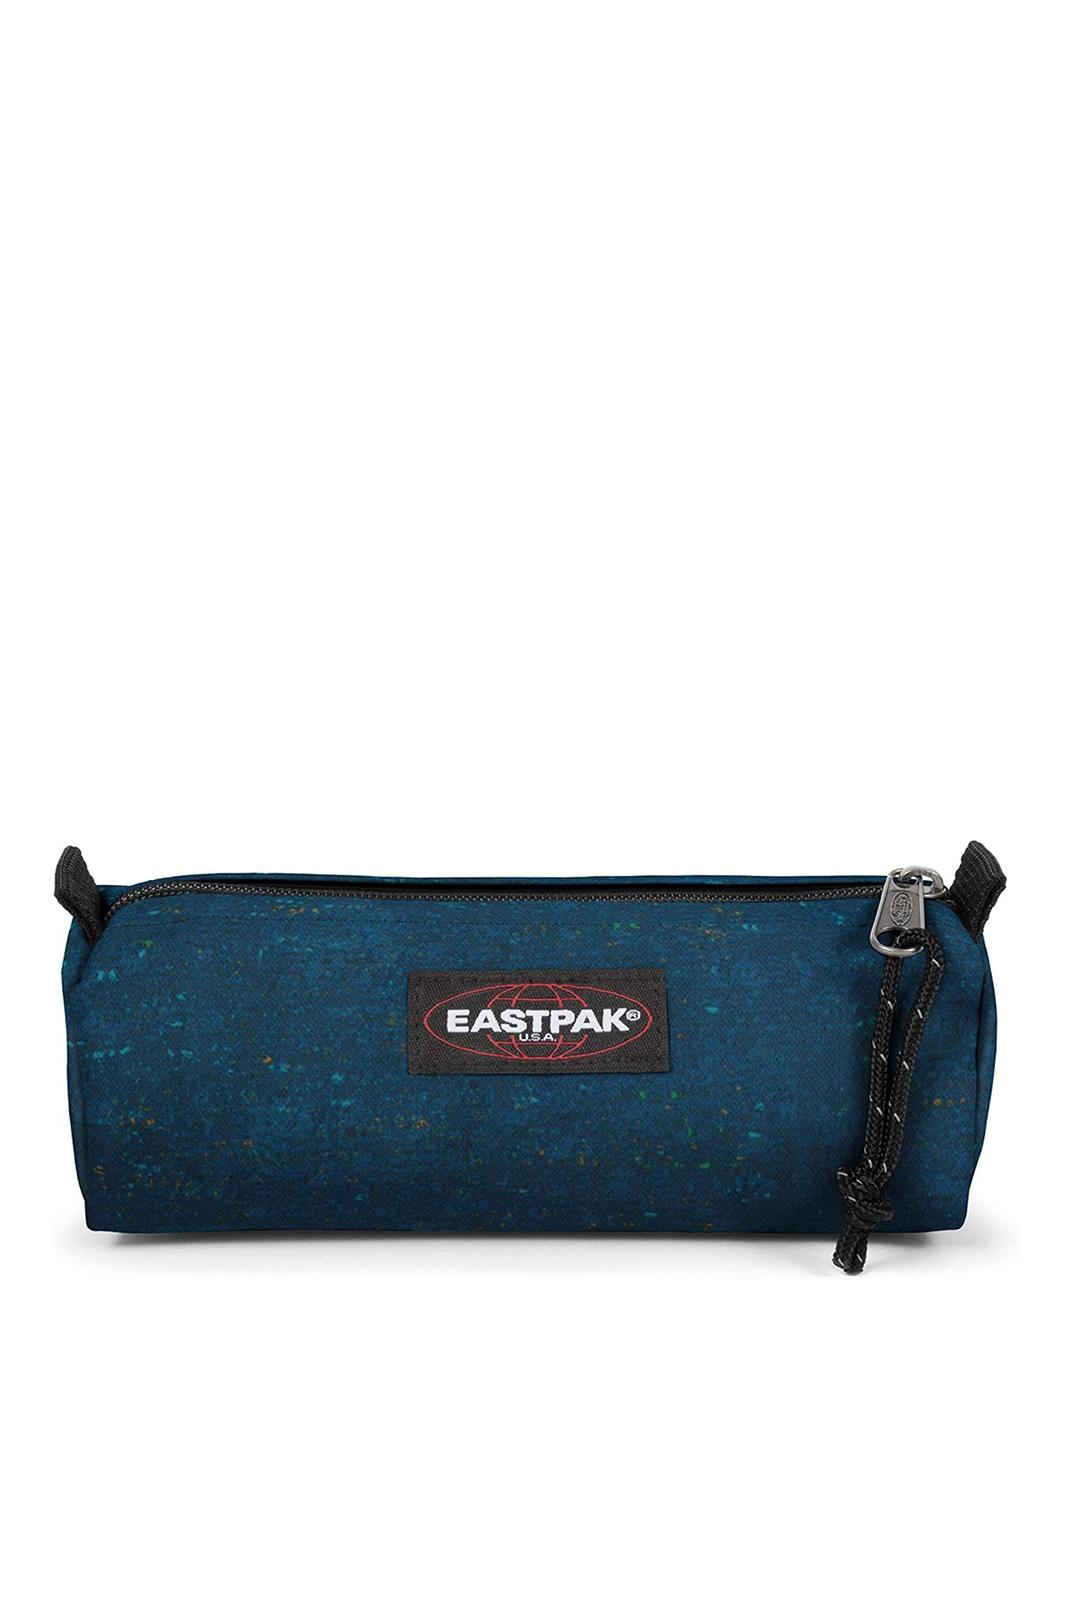 Etuis / Trousses  Eastpak EK372A50 A50 NEP GULF